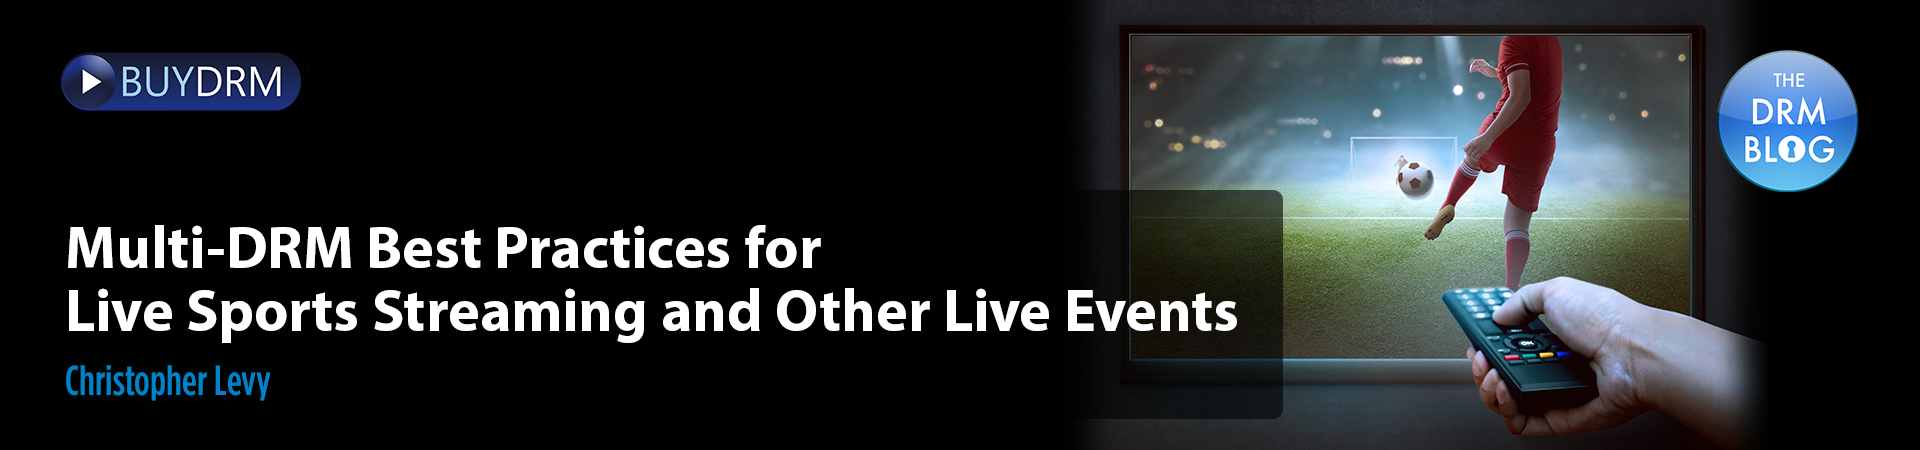 BuyDRM_LiveSports_1920x450